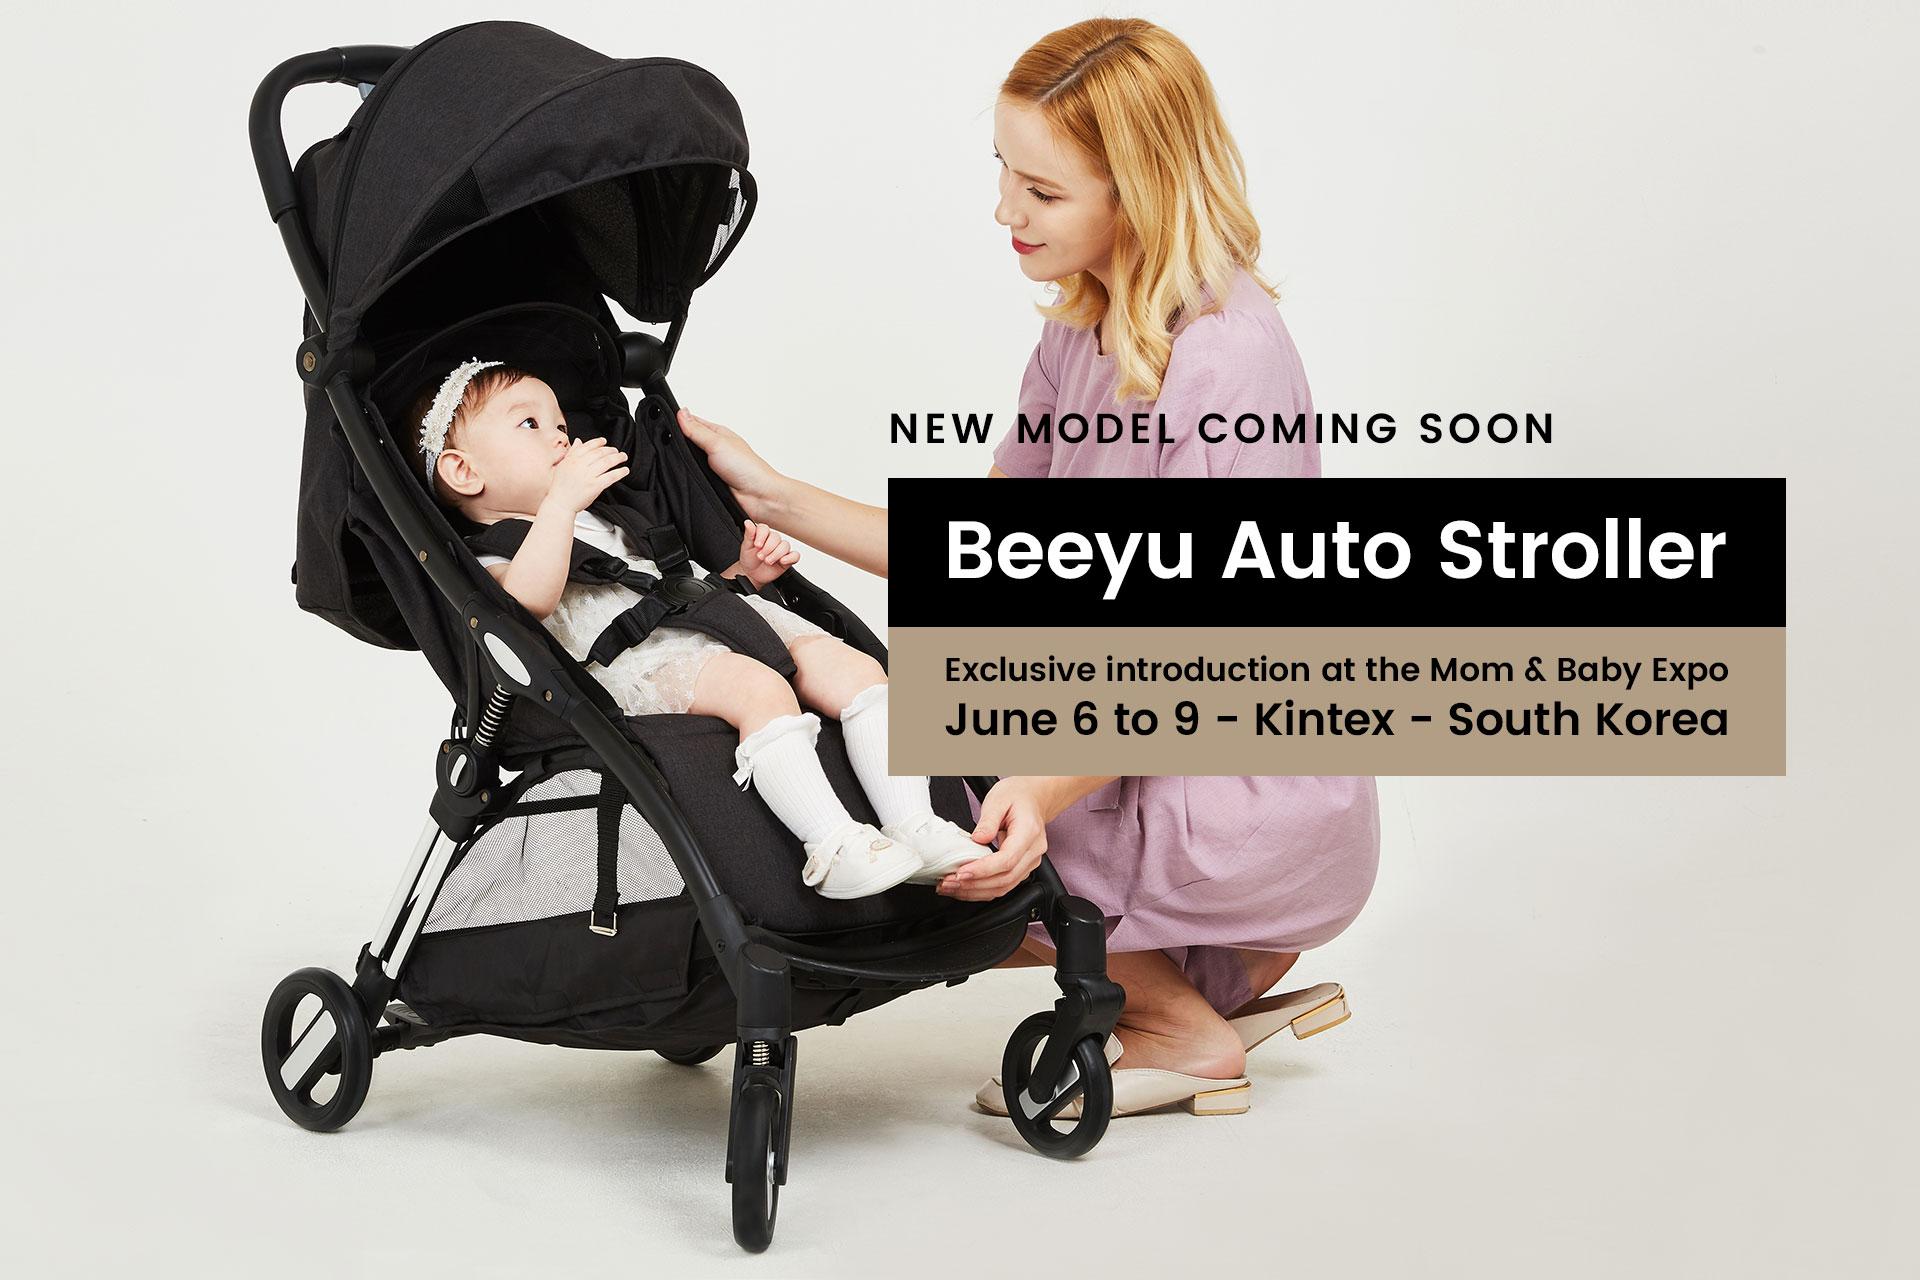 Beeyu Auto Stroller